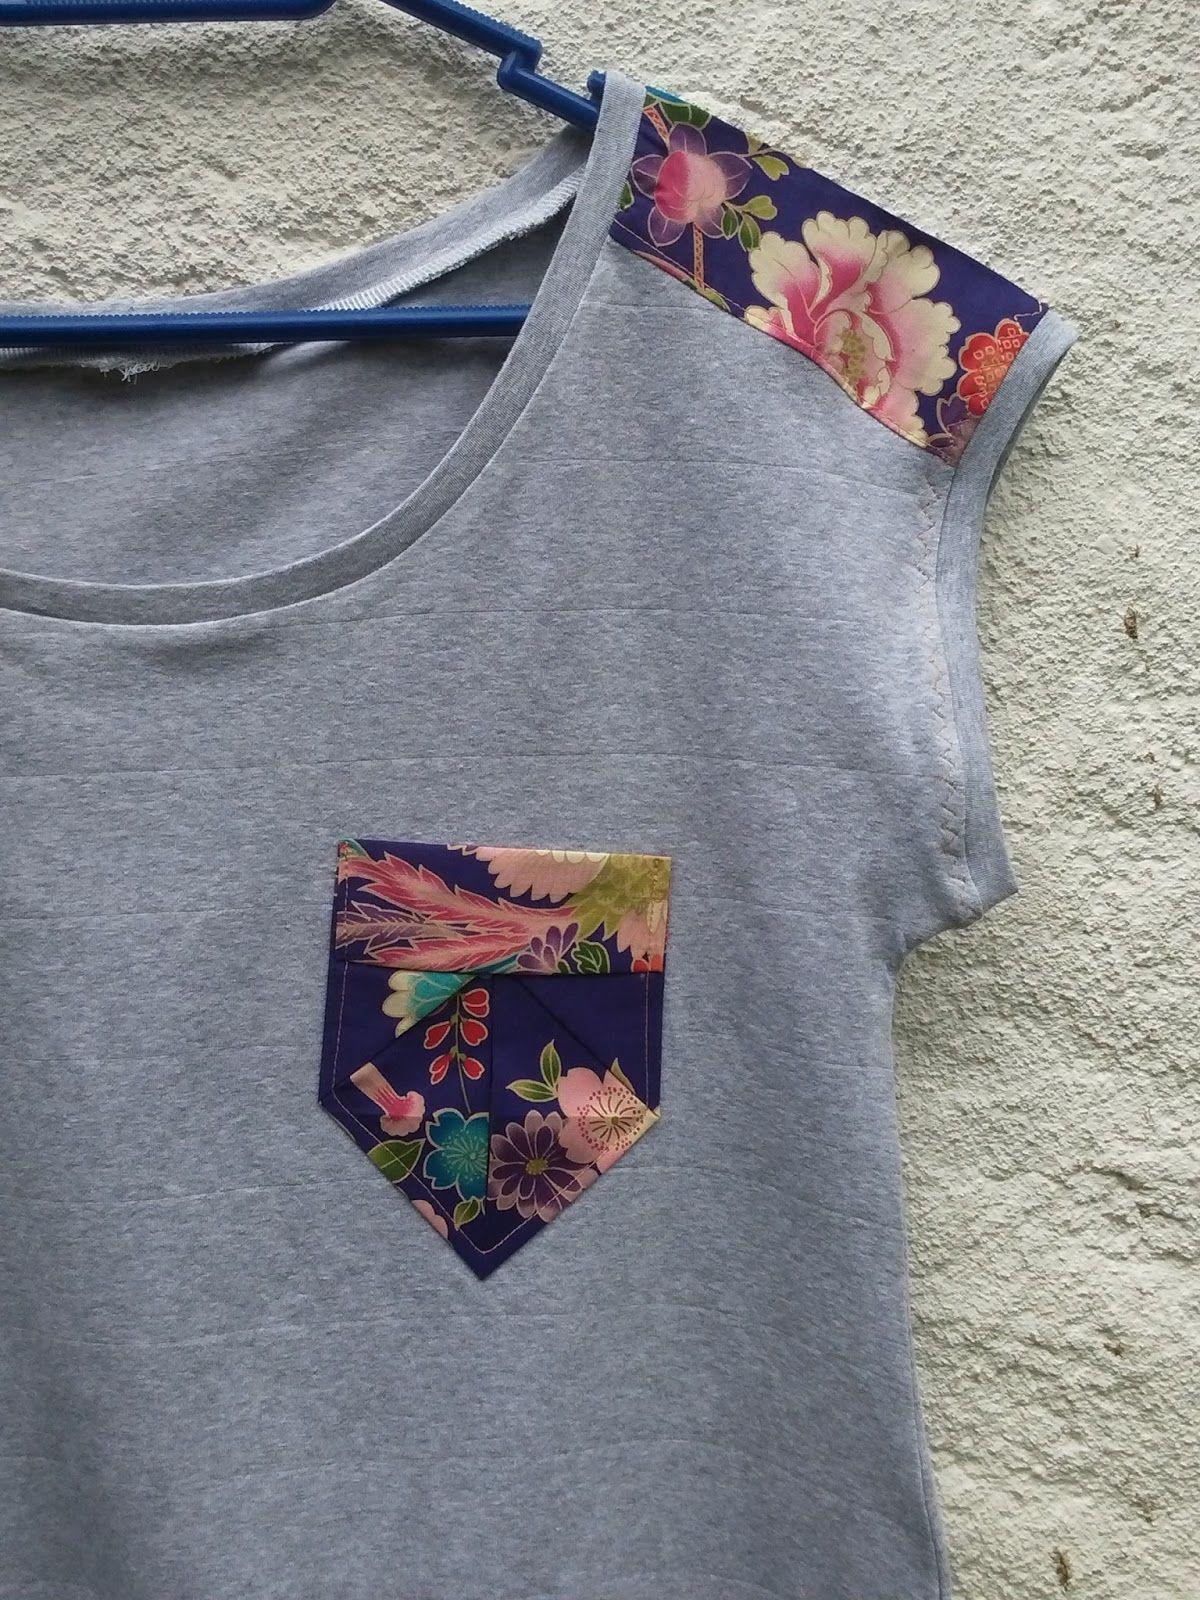 Te atreves a alegrar una camiseta con un bolsillo de origami esta te atreves a alegrar una camiseta con un bolsillo de origami esta es la propuesta de laura martnez de peseta este es mi pr altavistaventures Image collections